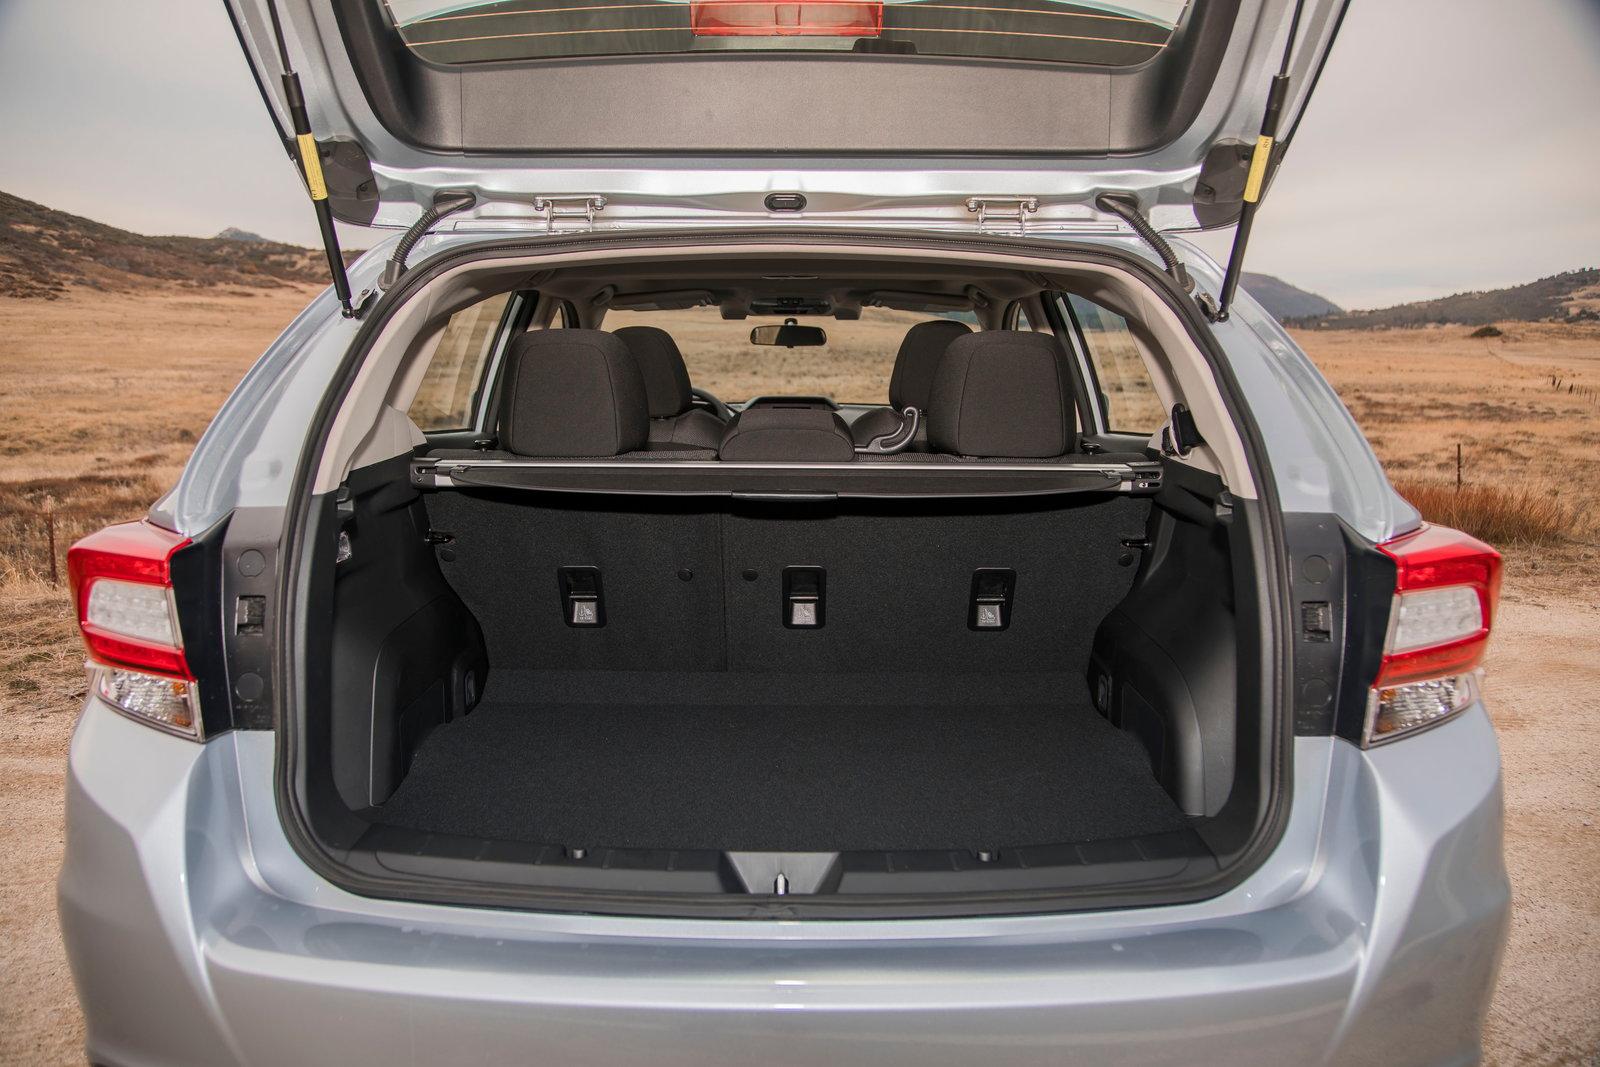 Used Subaru Impreza Hatchback >> 2019 Subaru Impreza: Preview, Pricing, Release Date